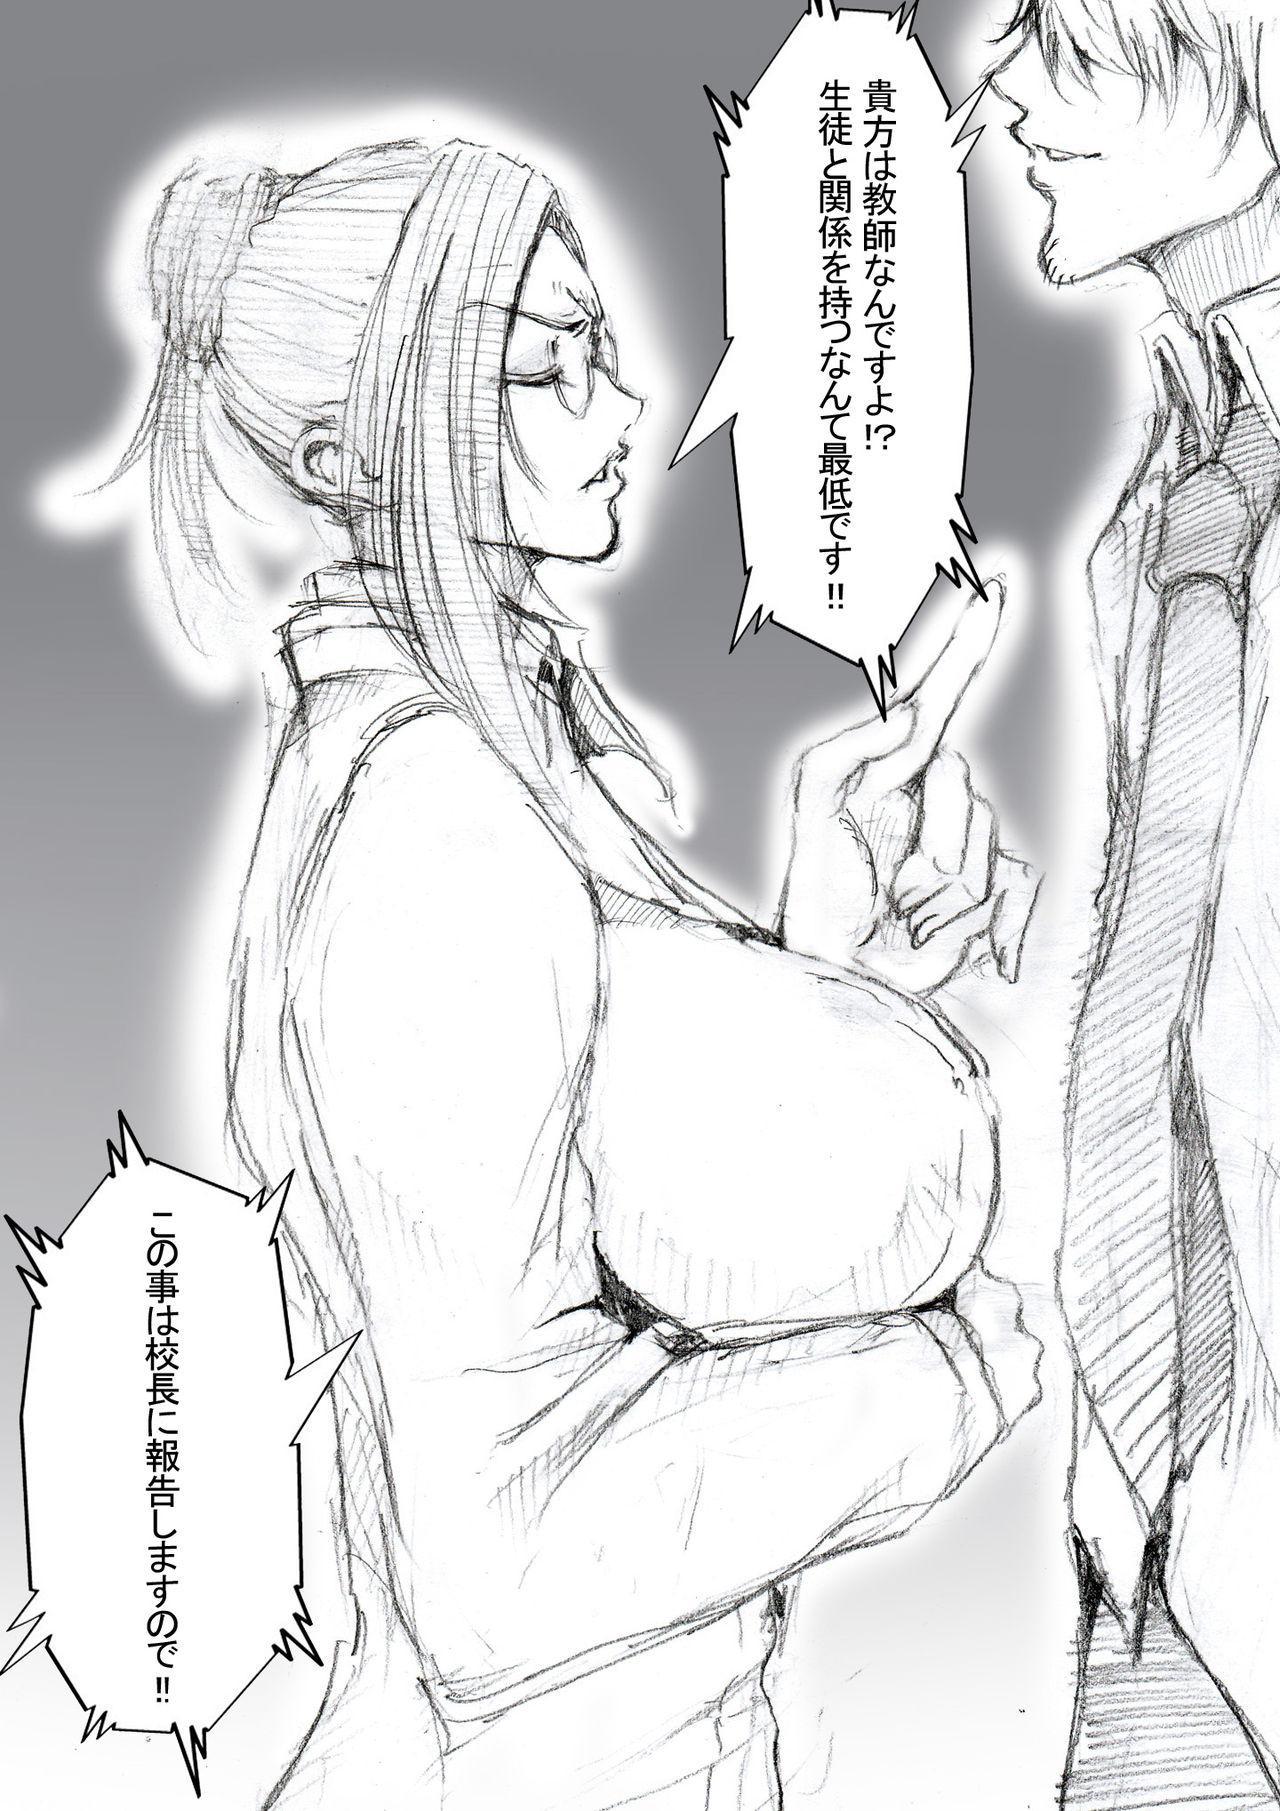 市ノ瀬美加子の場合 6